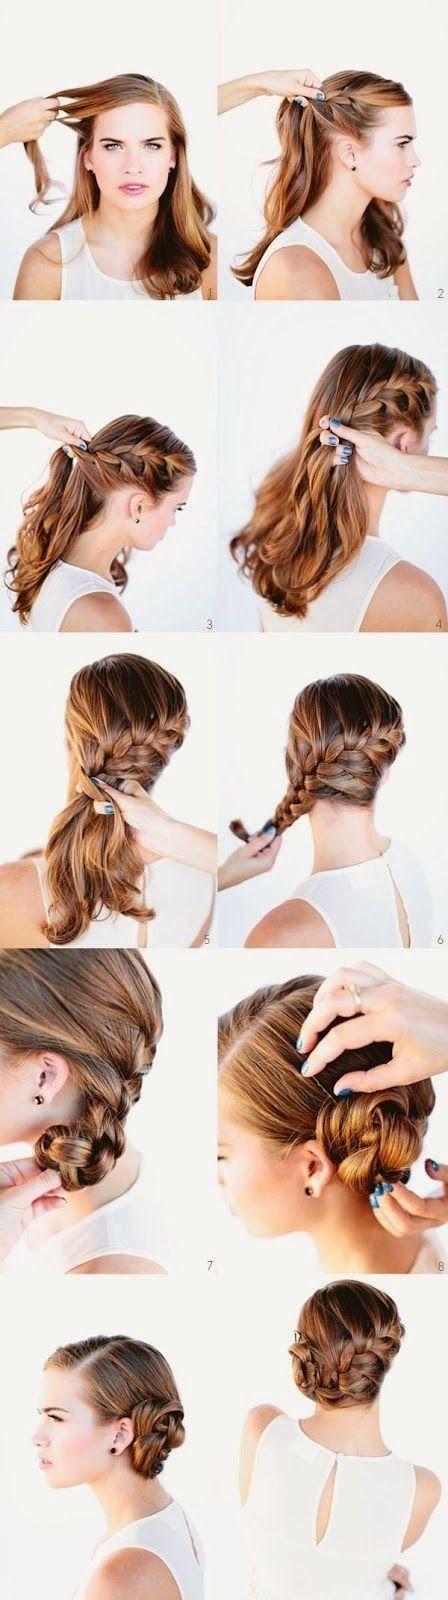 DIY Hair: Step by Step Braids and Updos